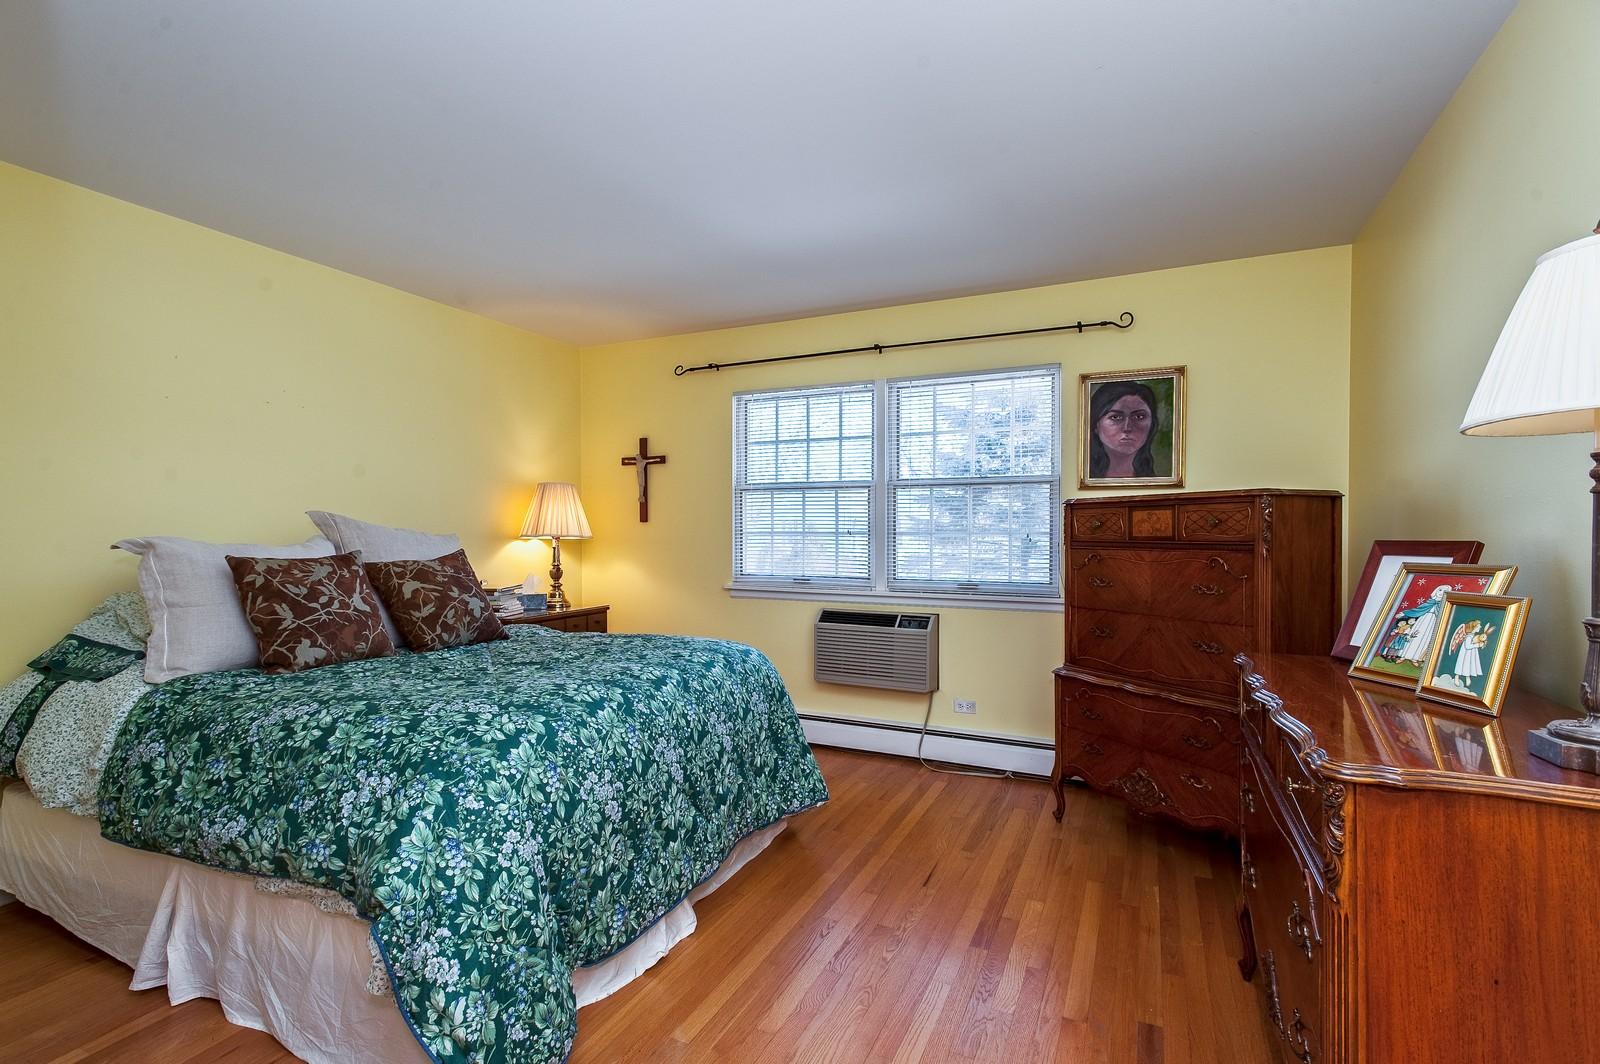 Real Estate Photography - 389 Bristol, Northfield, IL, 60093 - Master Bedroom